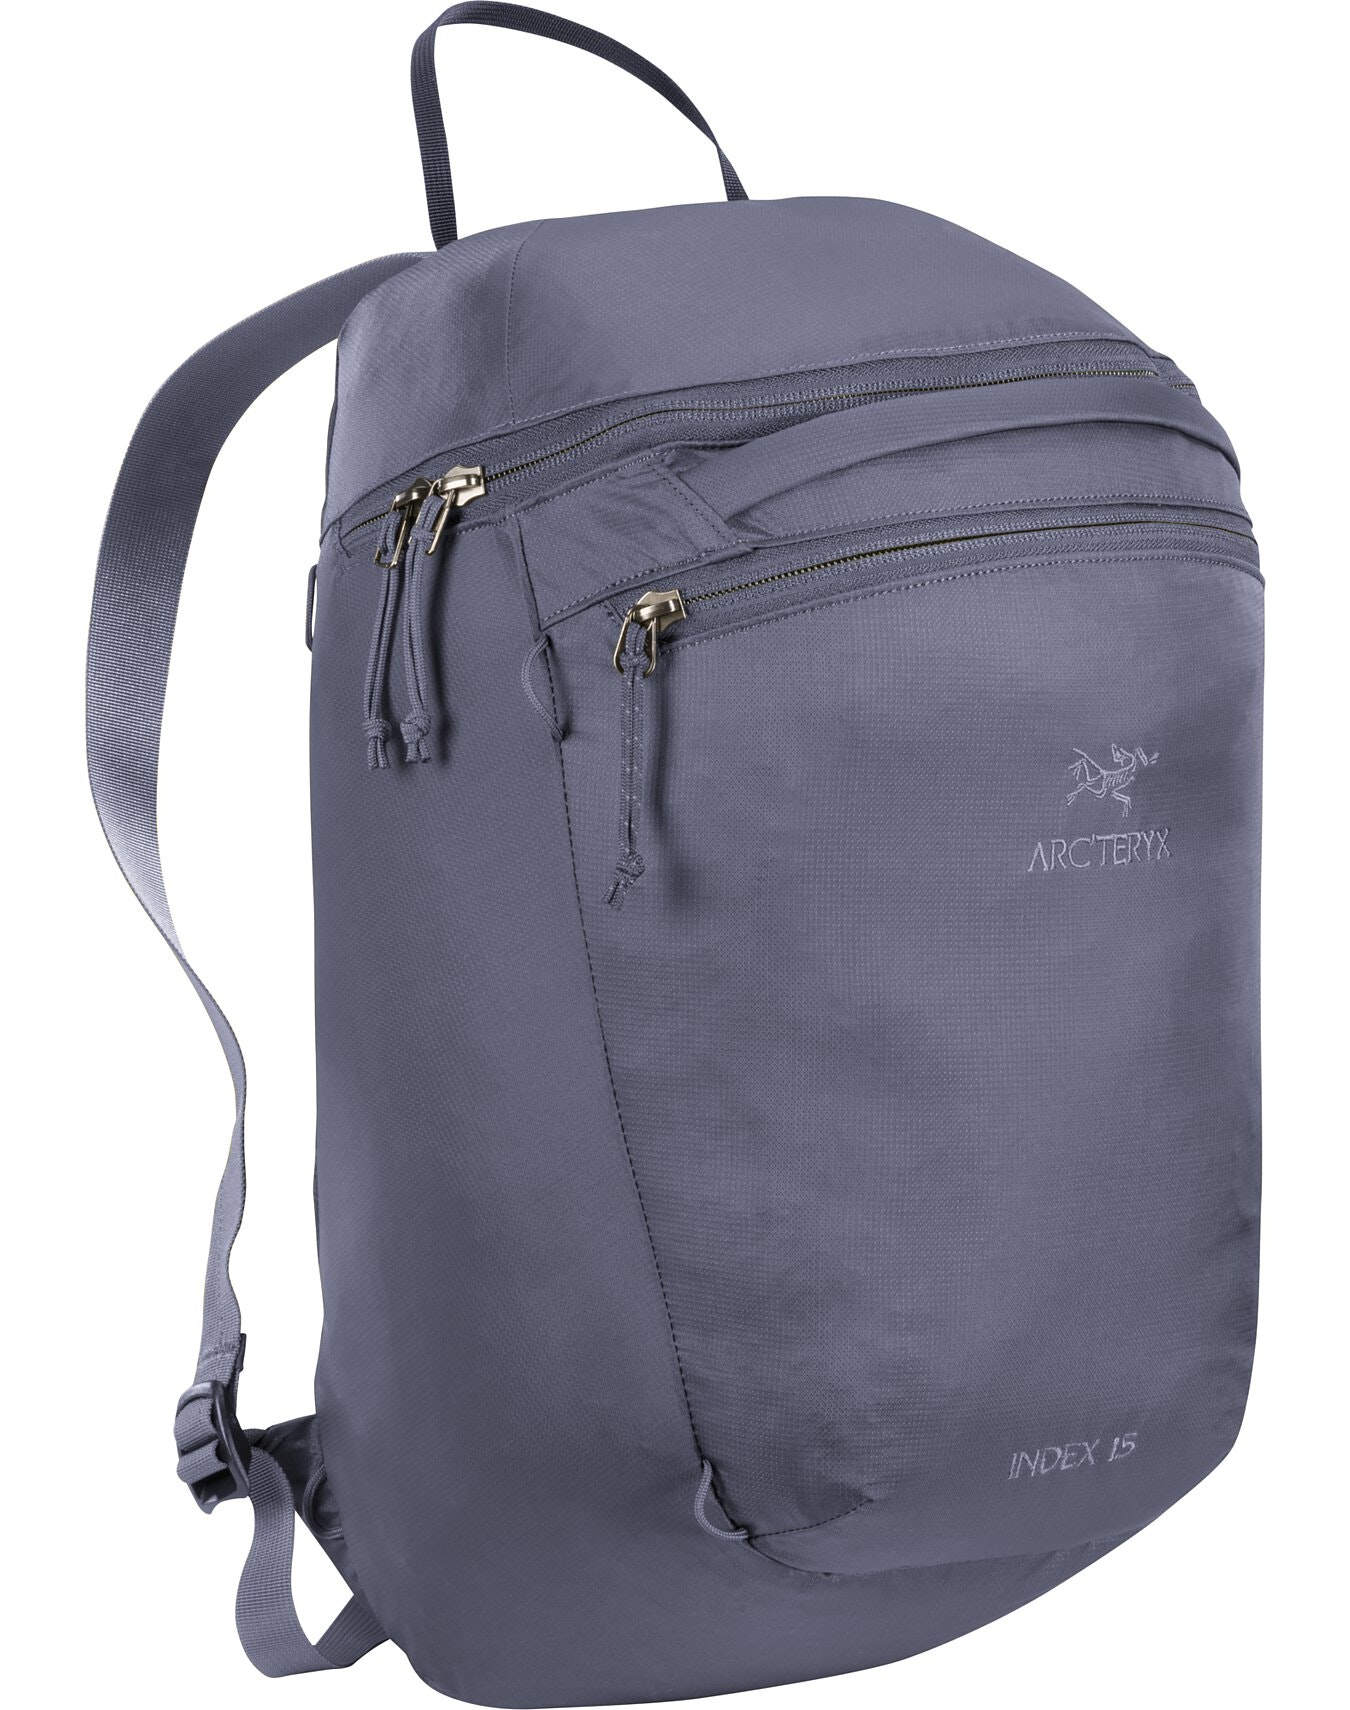 Index 15 Backpack Dark Mirai